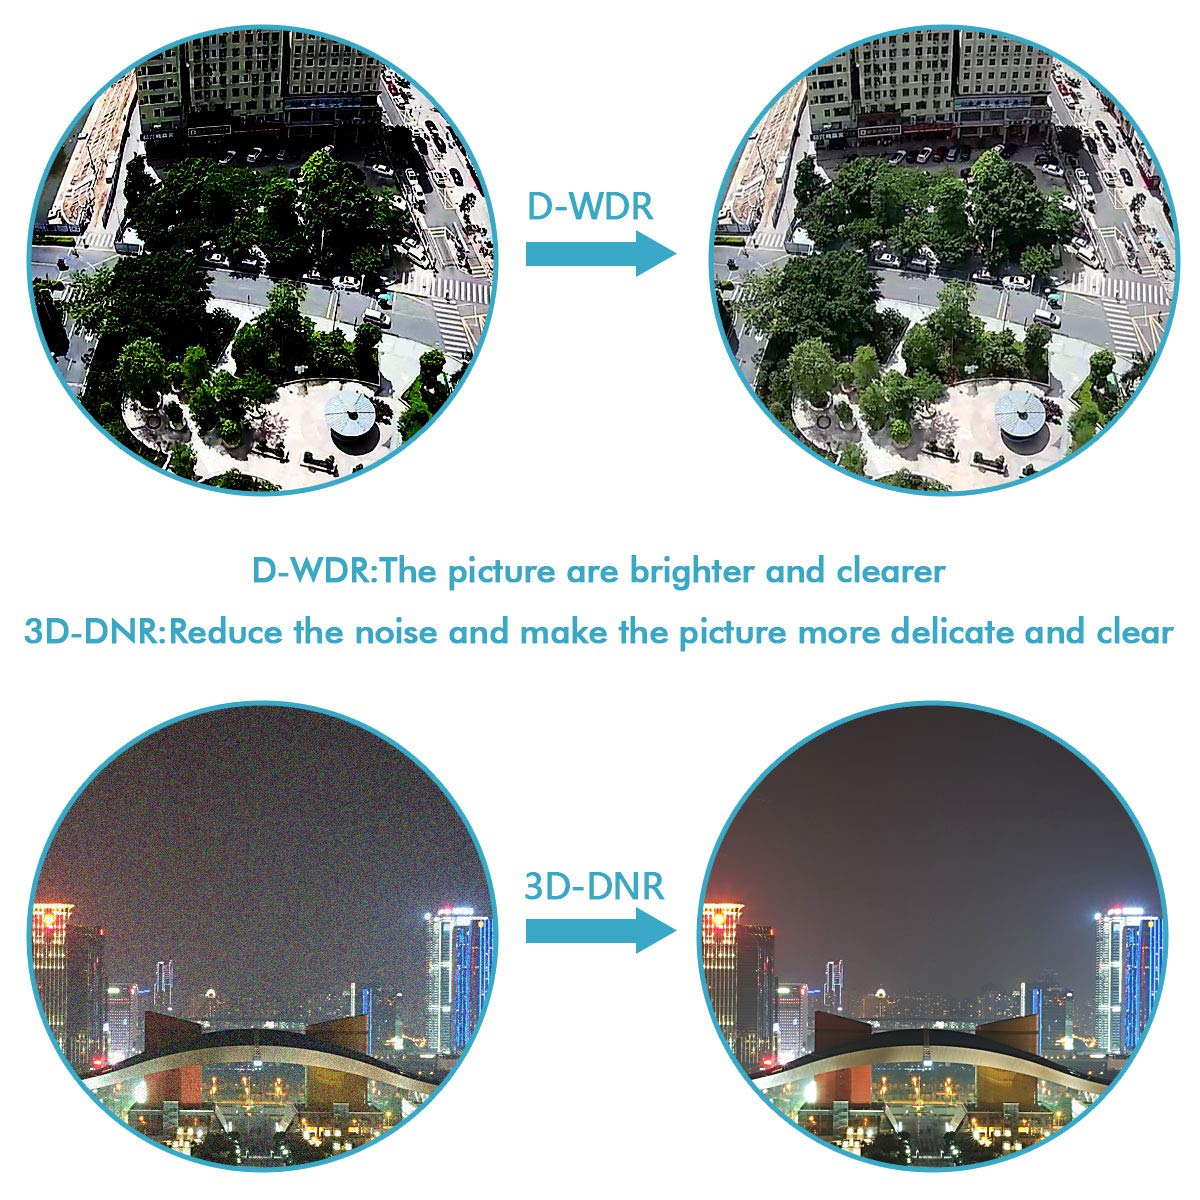 Tanto para Interiores como para Exteriores C/ámara de vigilancia con c/ámara Domo IP IP66 resoluci/ón 1920X1080 alimentaci/ón a trav/és de Ethernet PoE